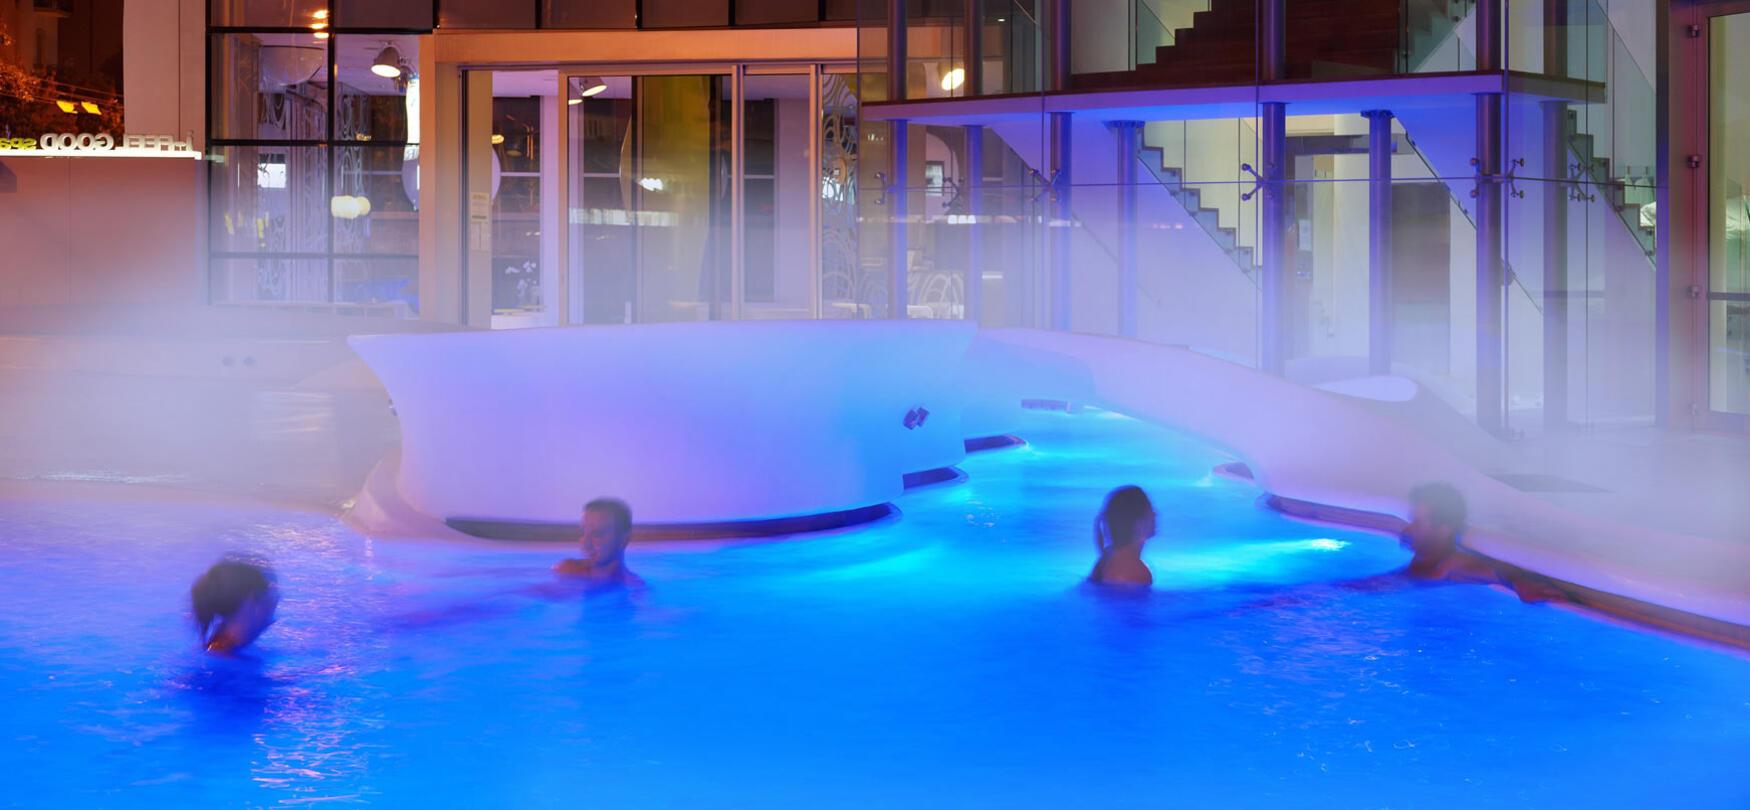 ambienthotels de hotels-rimini-ganzjahrig-geoffnet 004